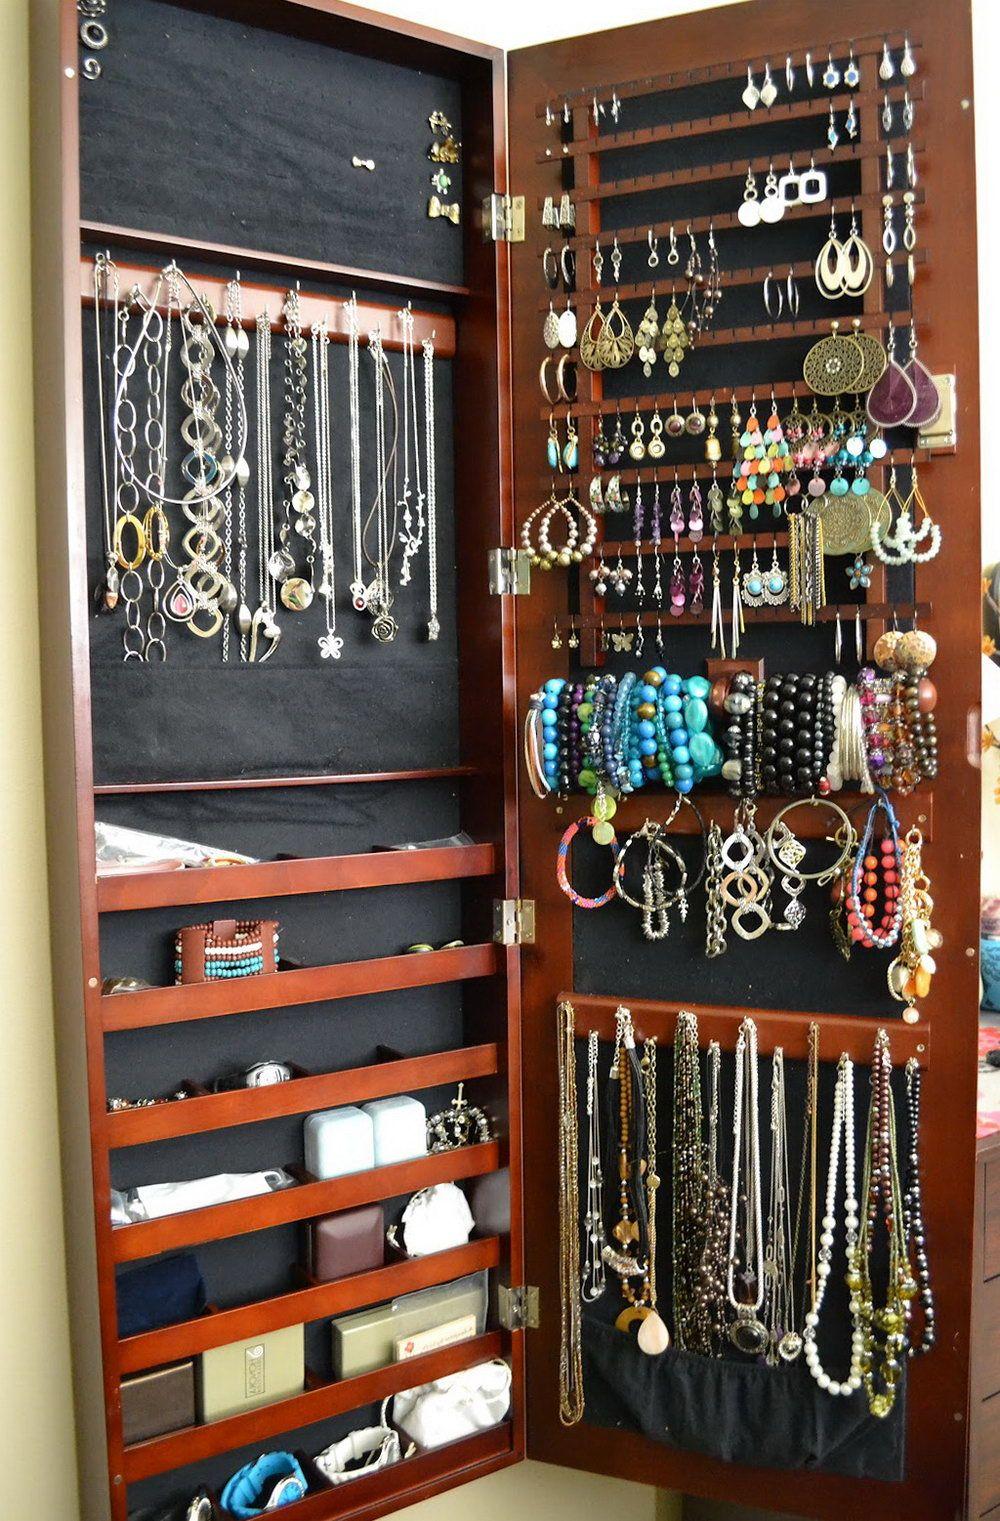 Pin By Svgproclub On We Love Art Jewelry Organizer Wall